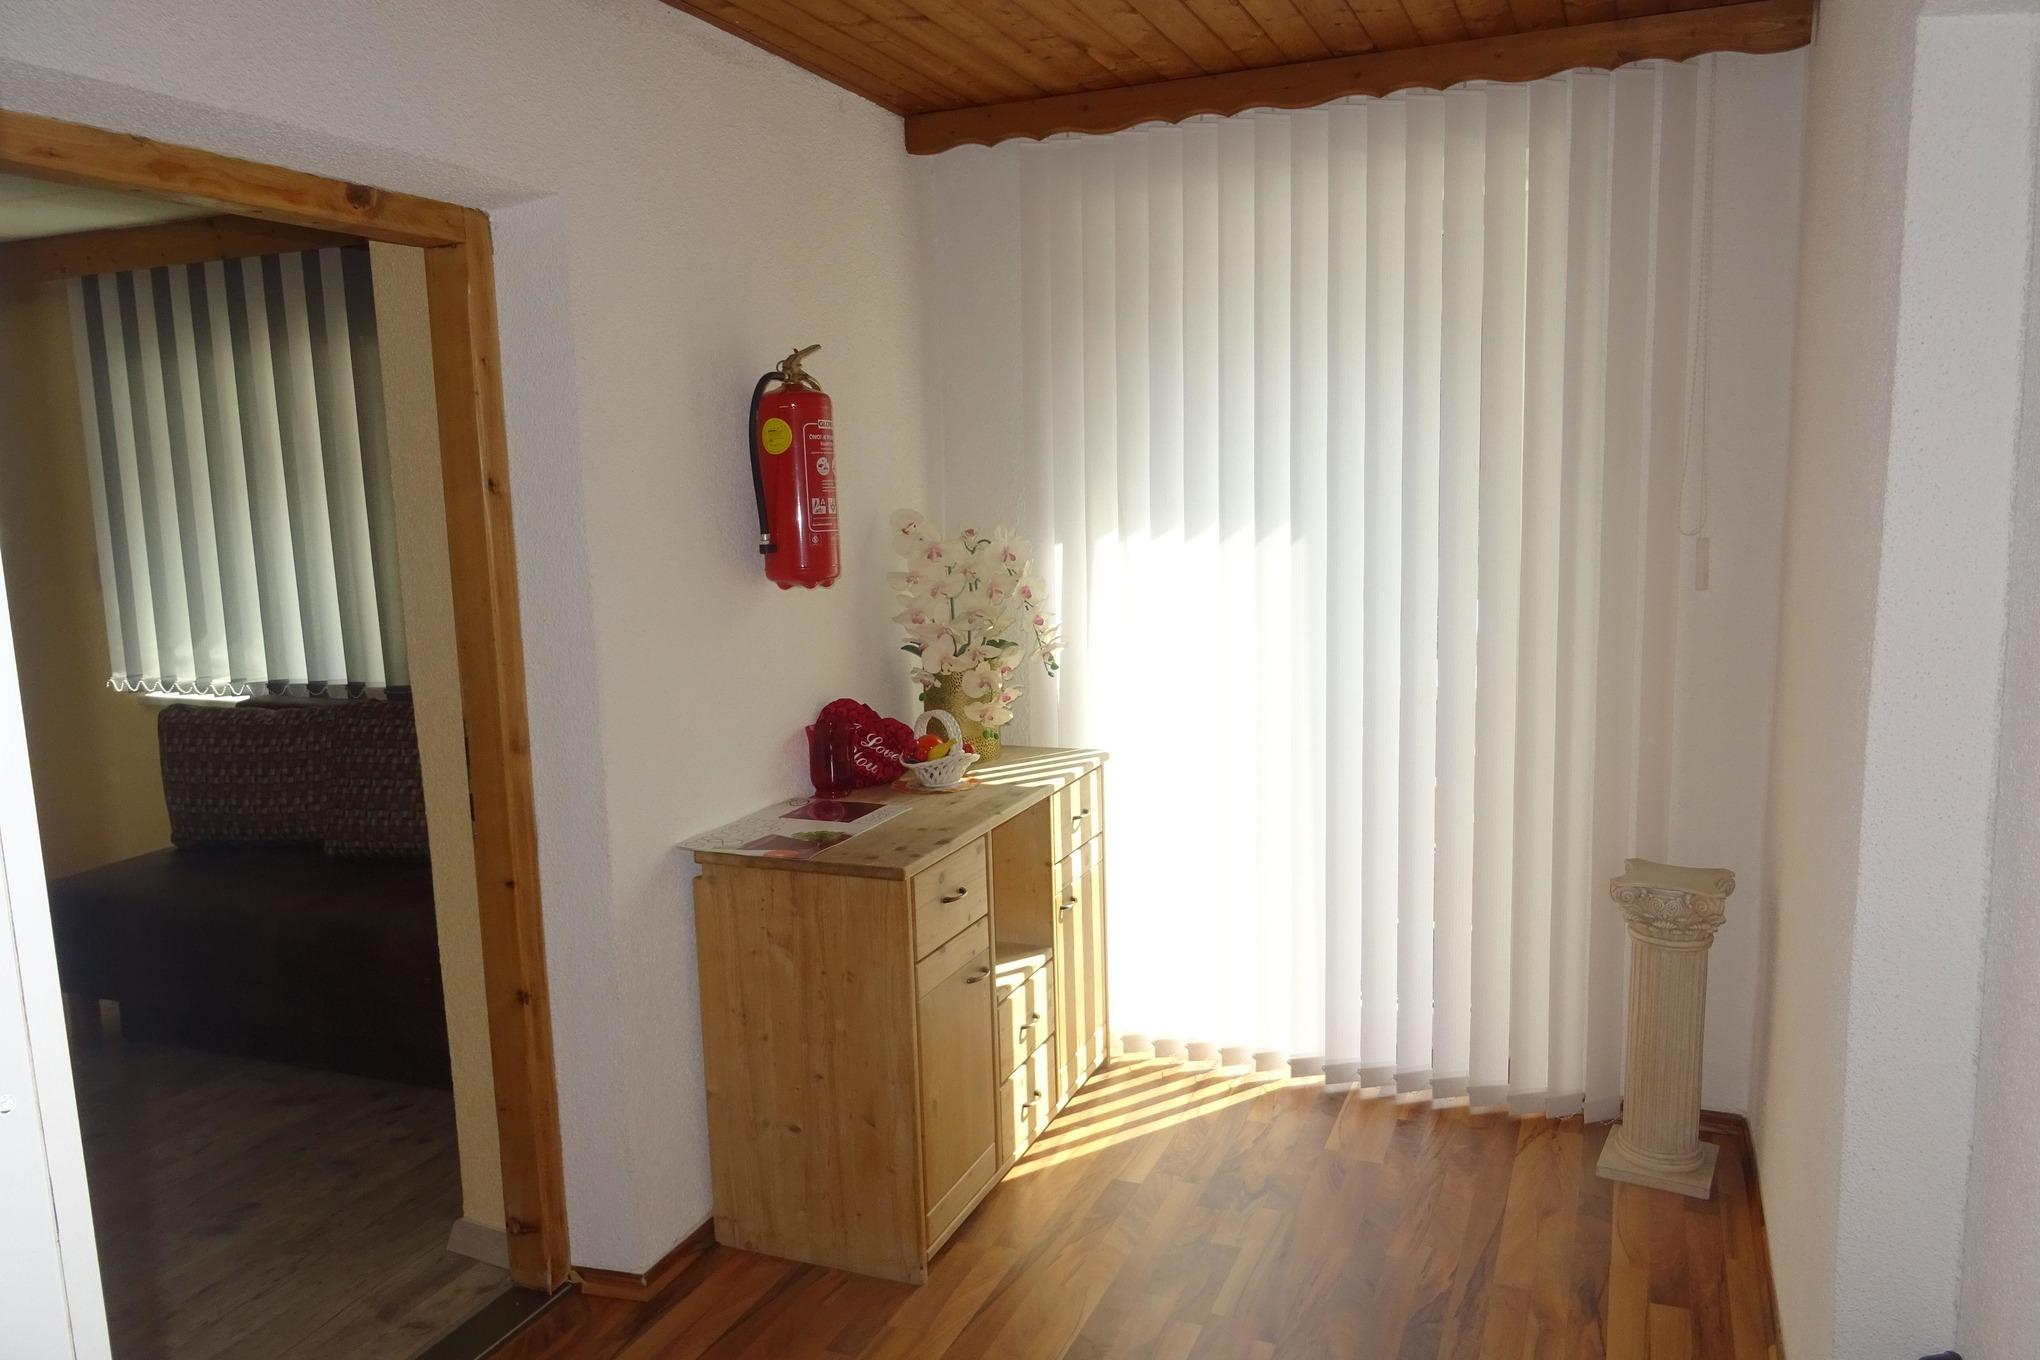 Appartement de vacances Gerti (1995761), Uderns, Zillertal, Tyrol, Autriche, image 10